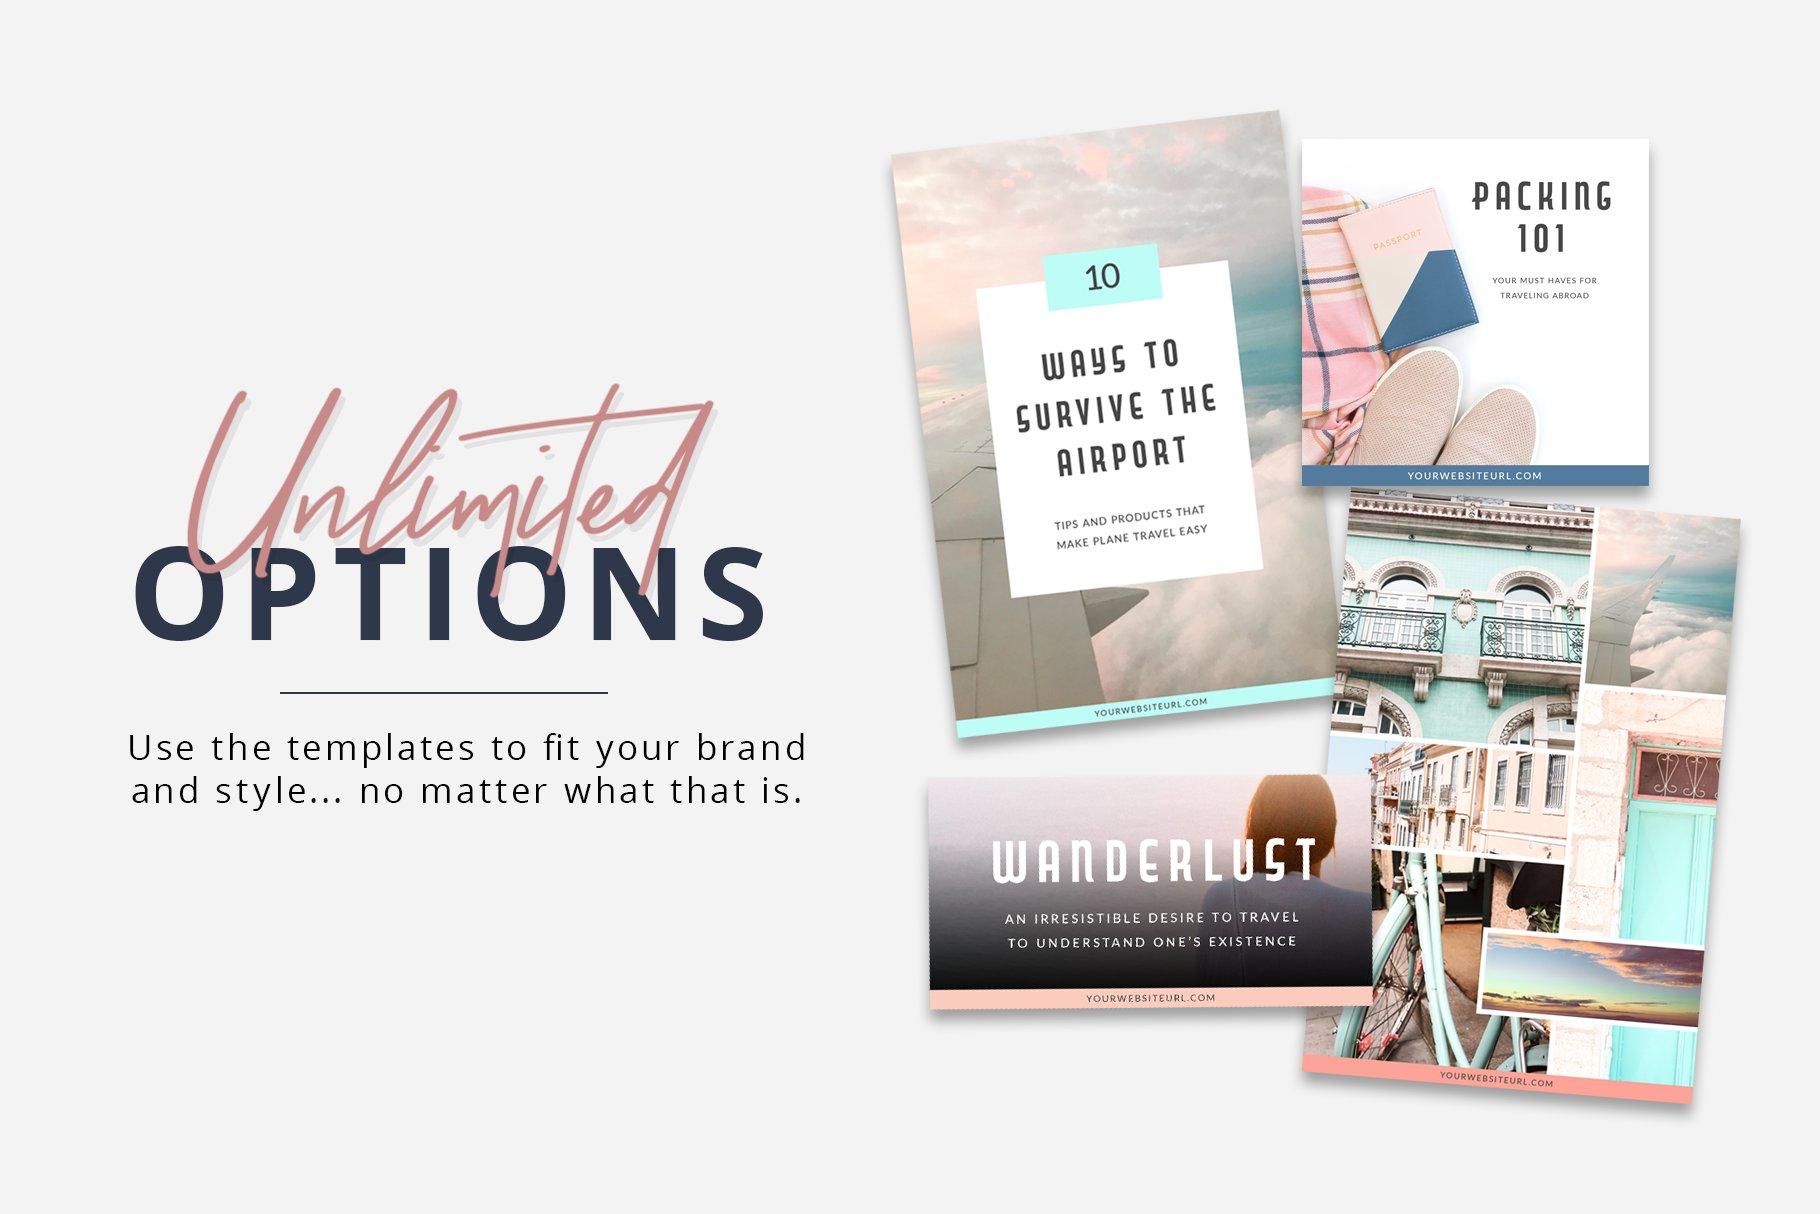 服装鞋子朋友圈主图排版Instagram模板 Social Media Templates Bundle插图(2)